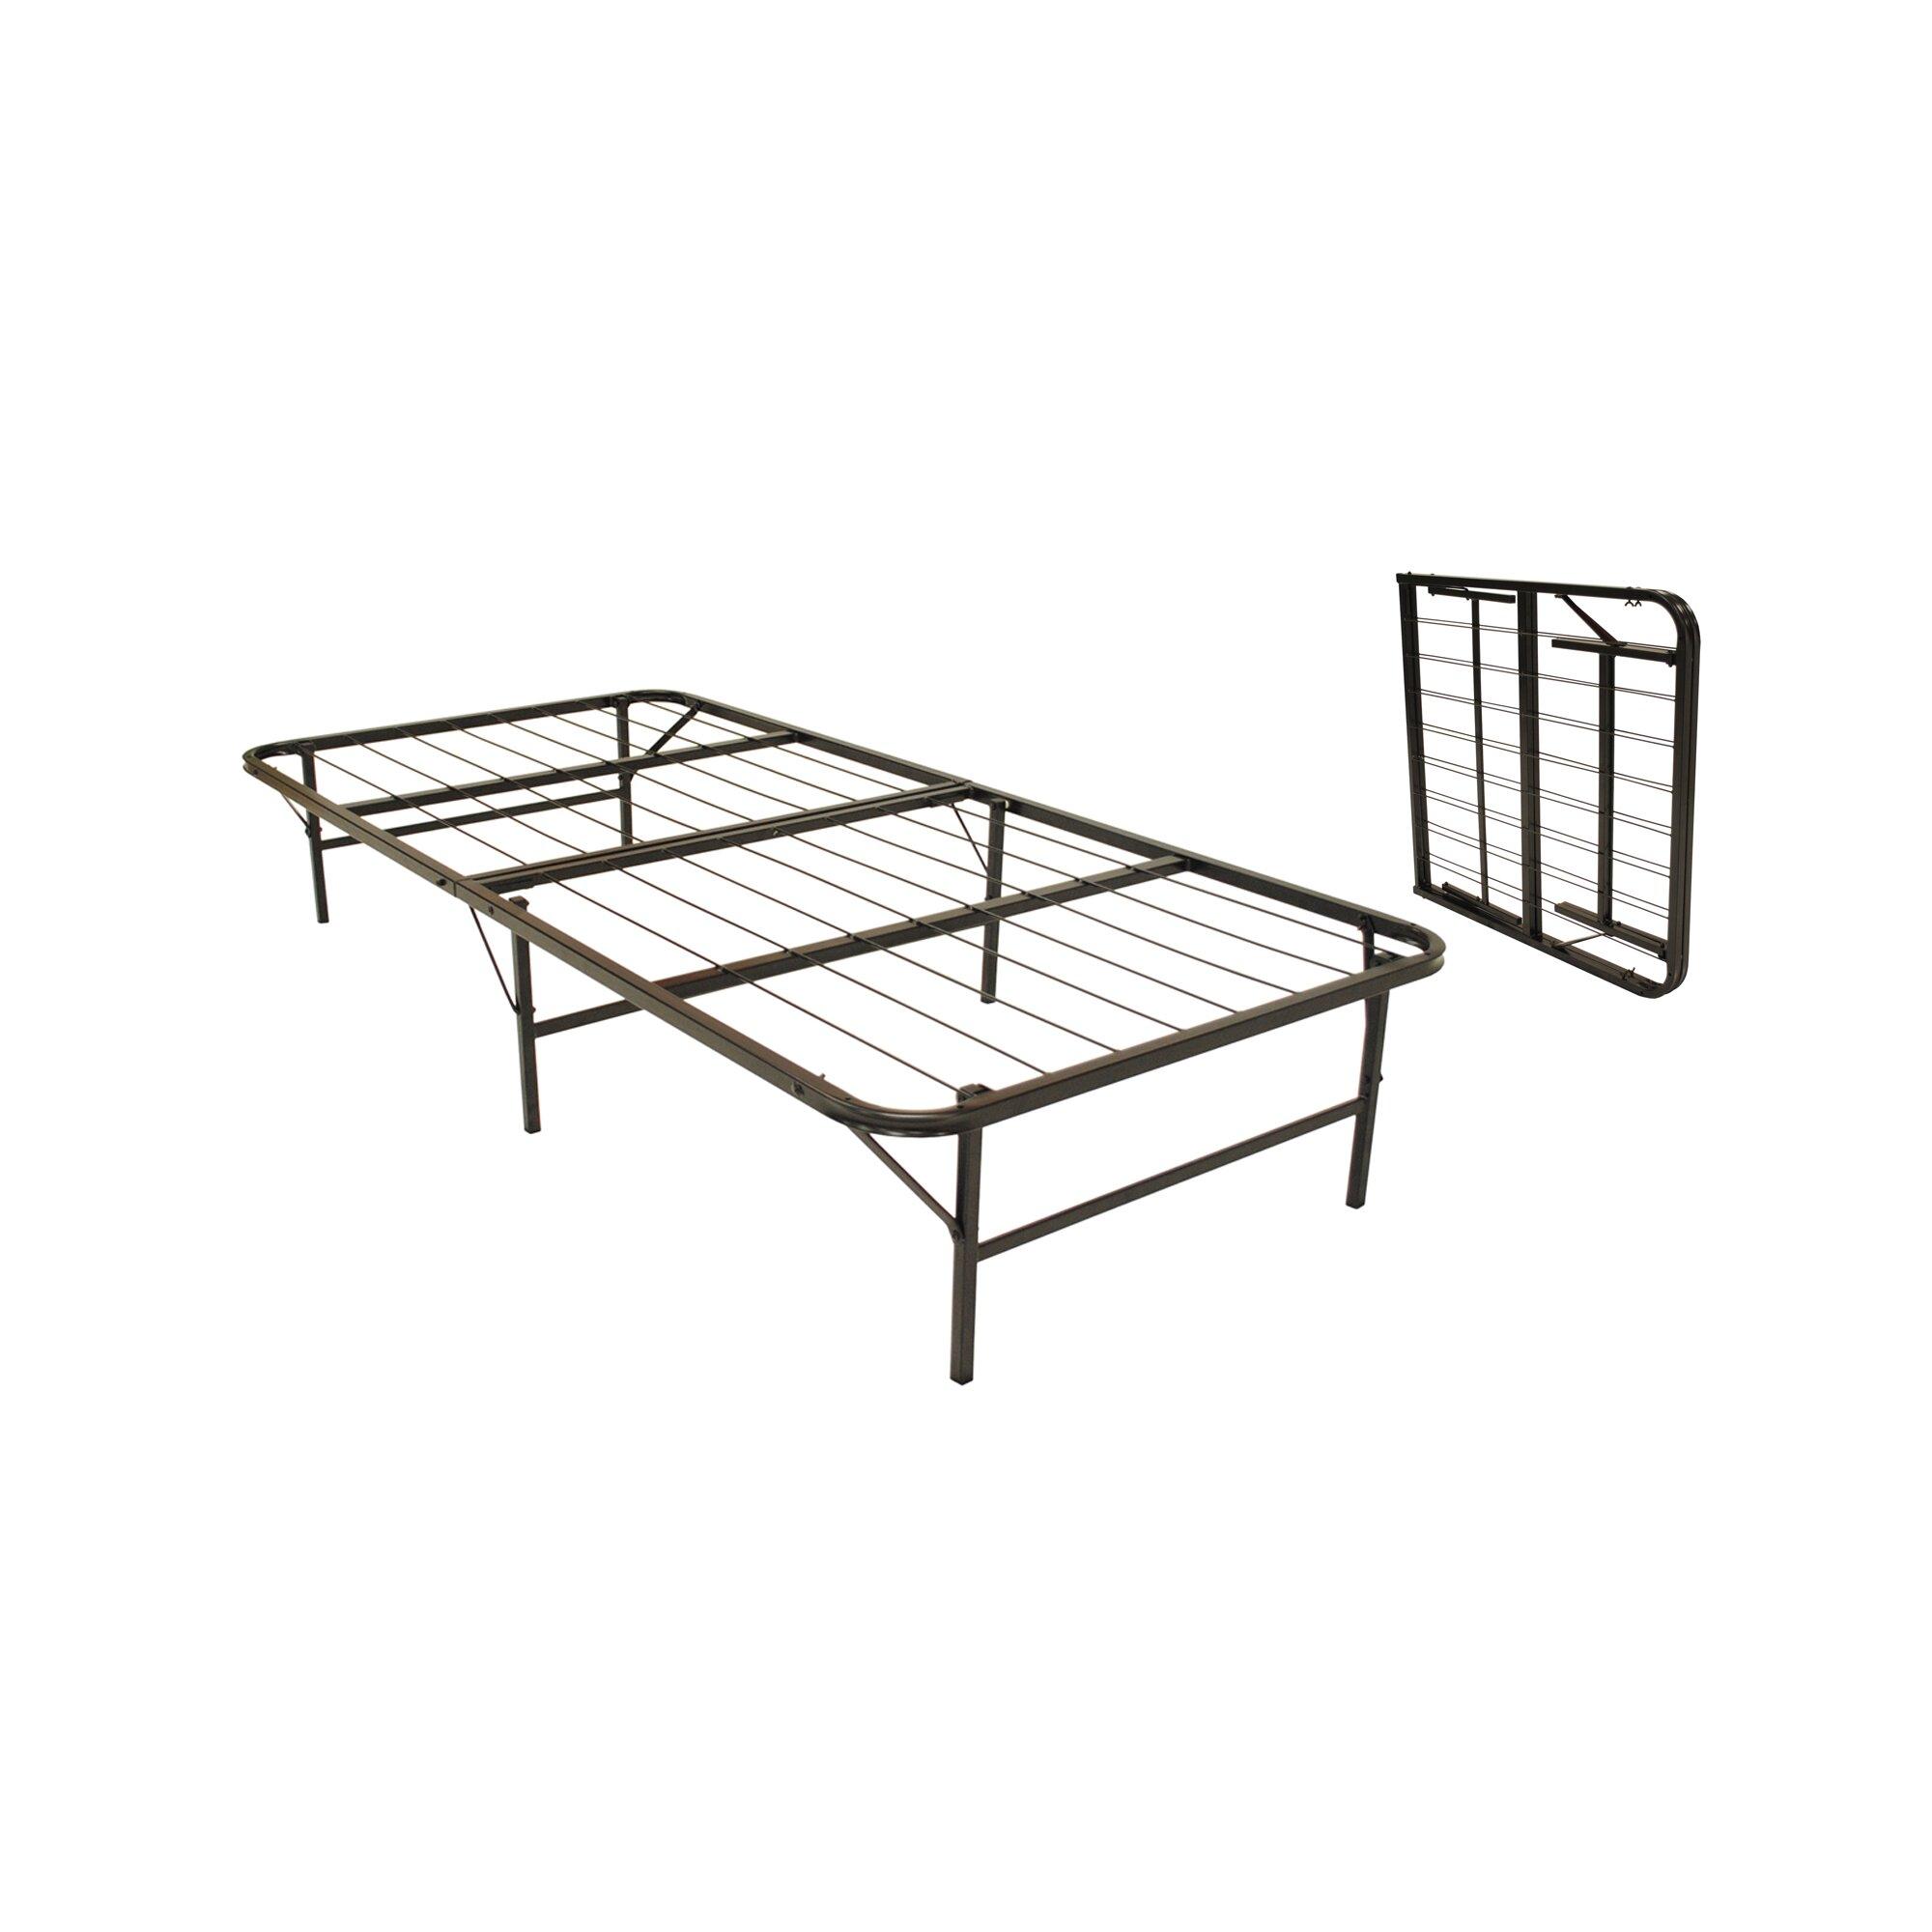 Pragma bed bi fold bed frame reviews wayfair for Folding futon bed frame